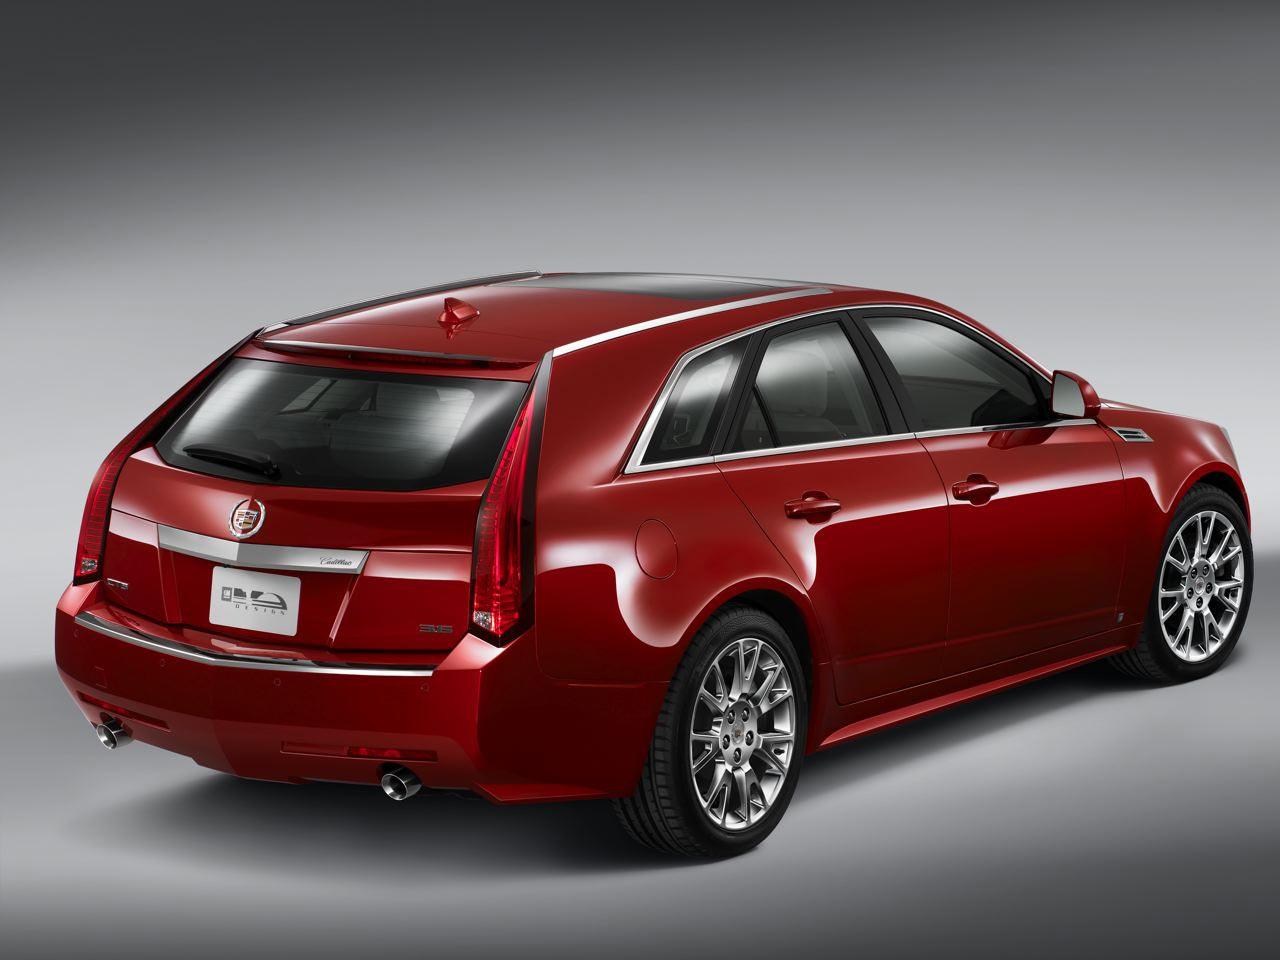 2010-Cadillac-CTS-Sport-Wagon-2